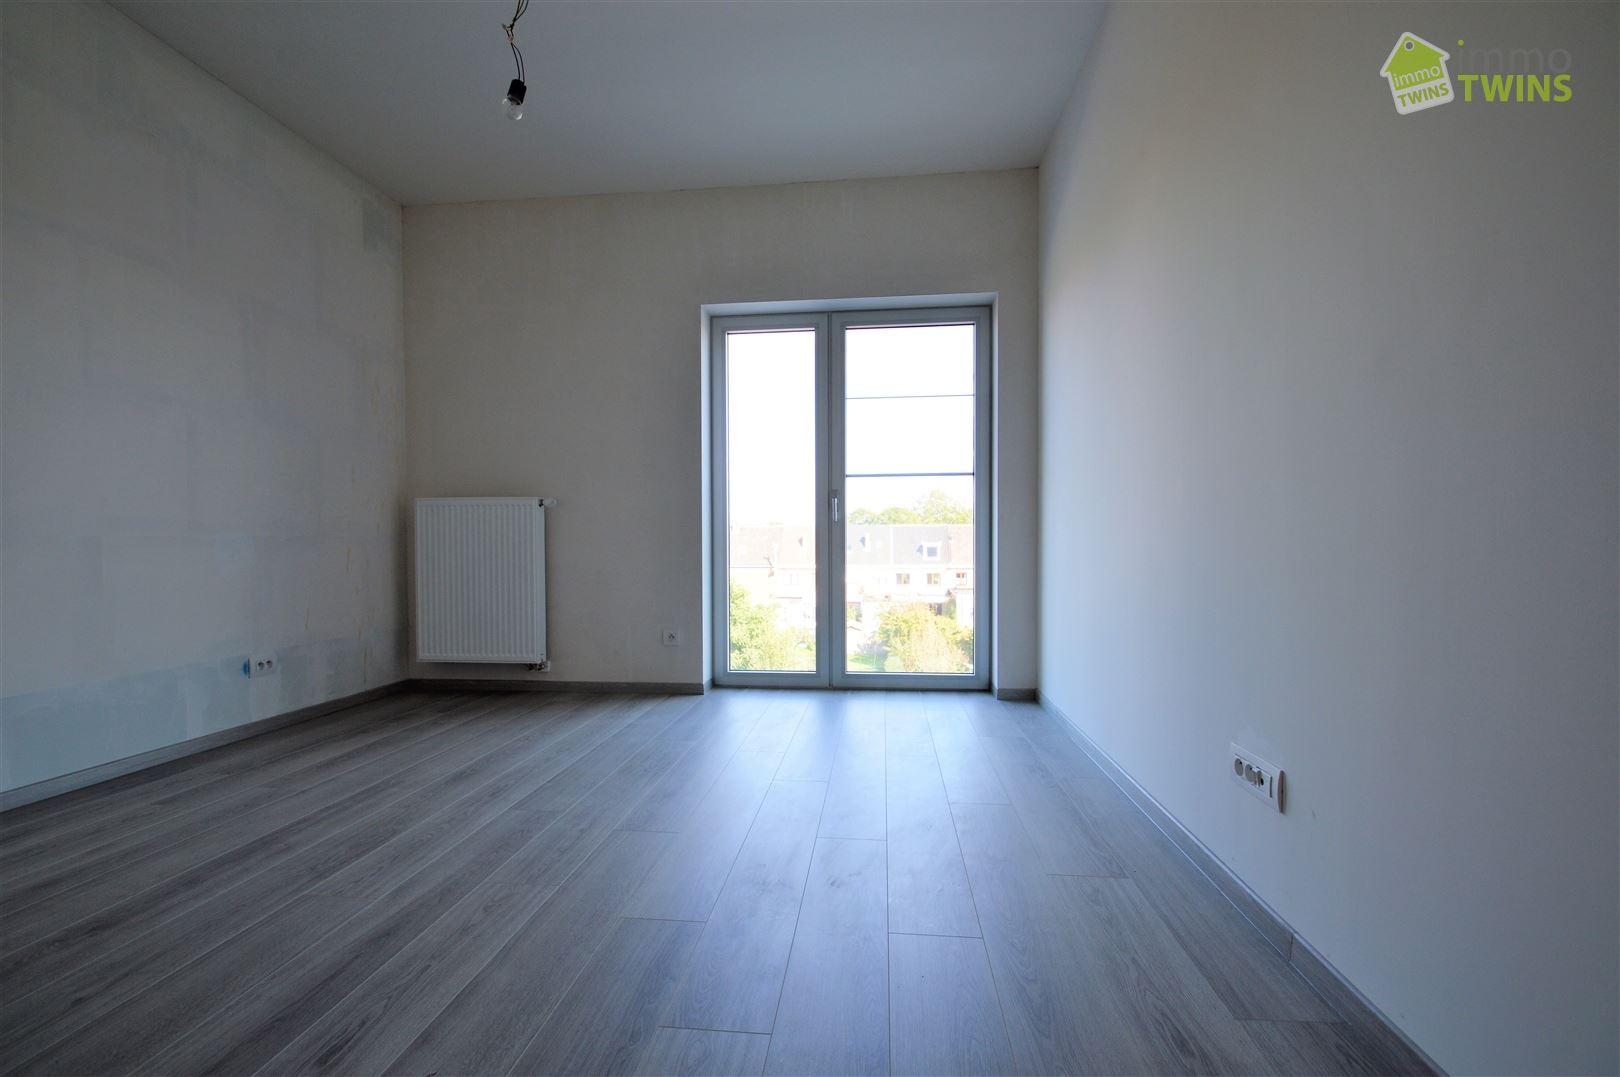 Foto 13 : Appartement te 9160 LOKEREN (België) - Prijs € 750